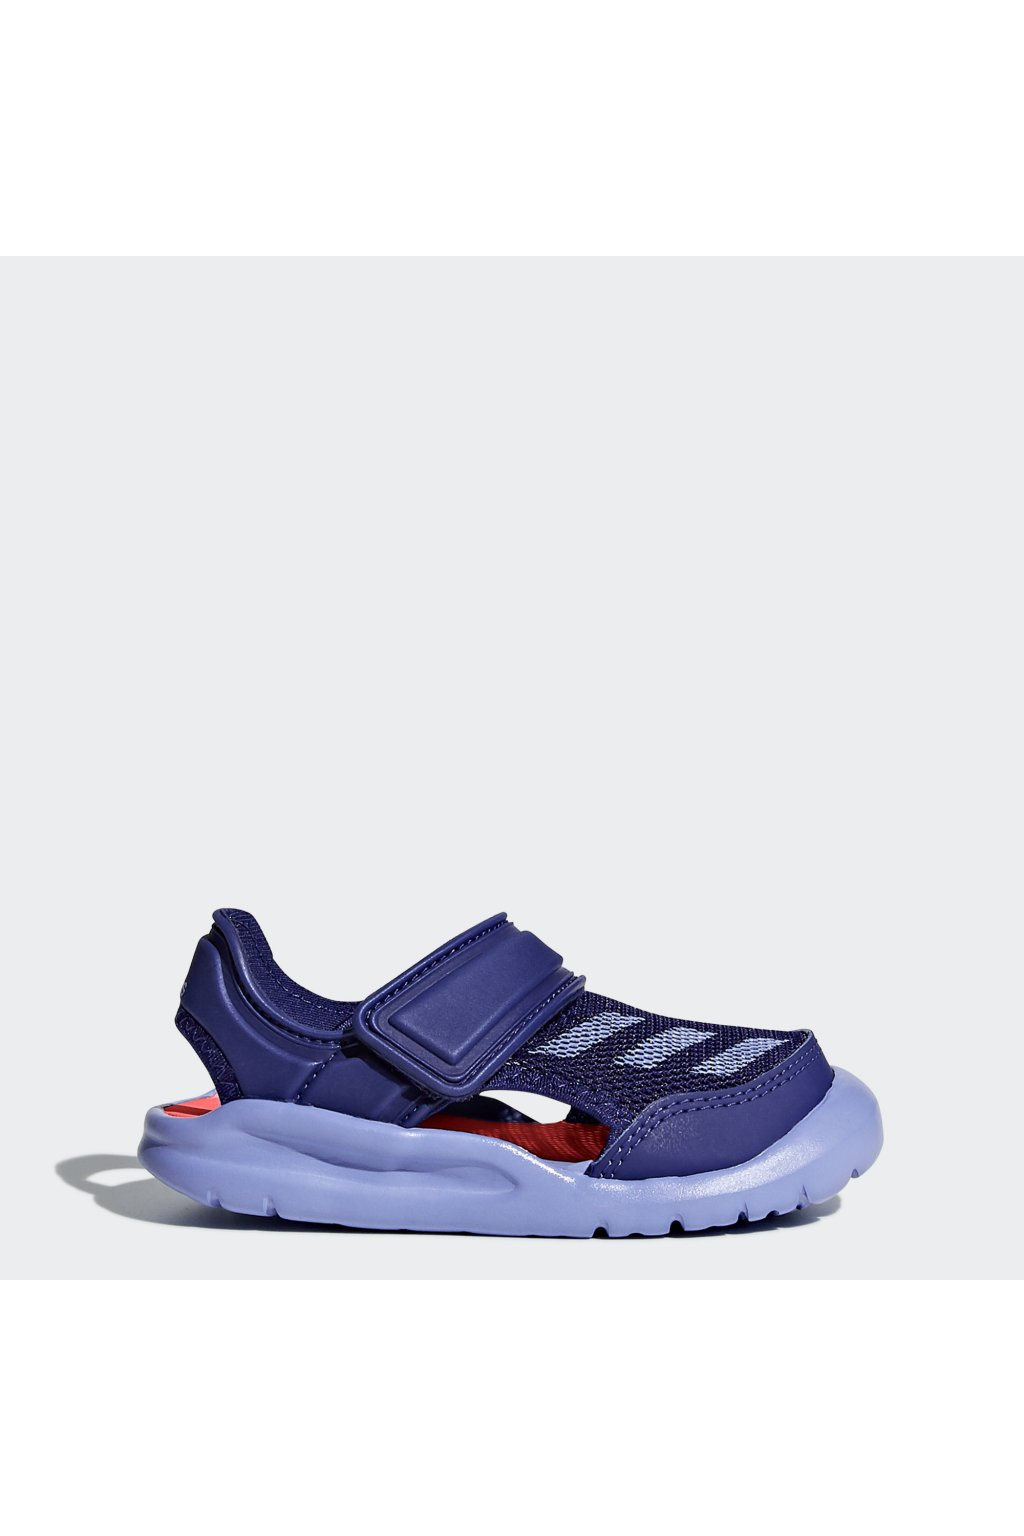 sandalky adidas fortaswim ac8148 (1)